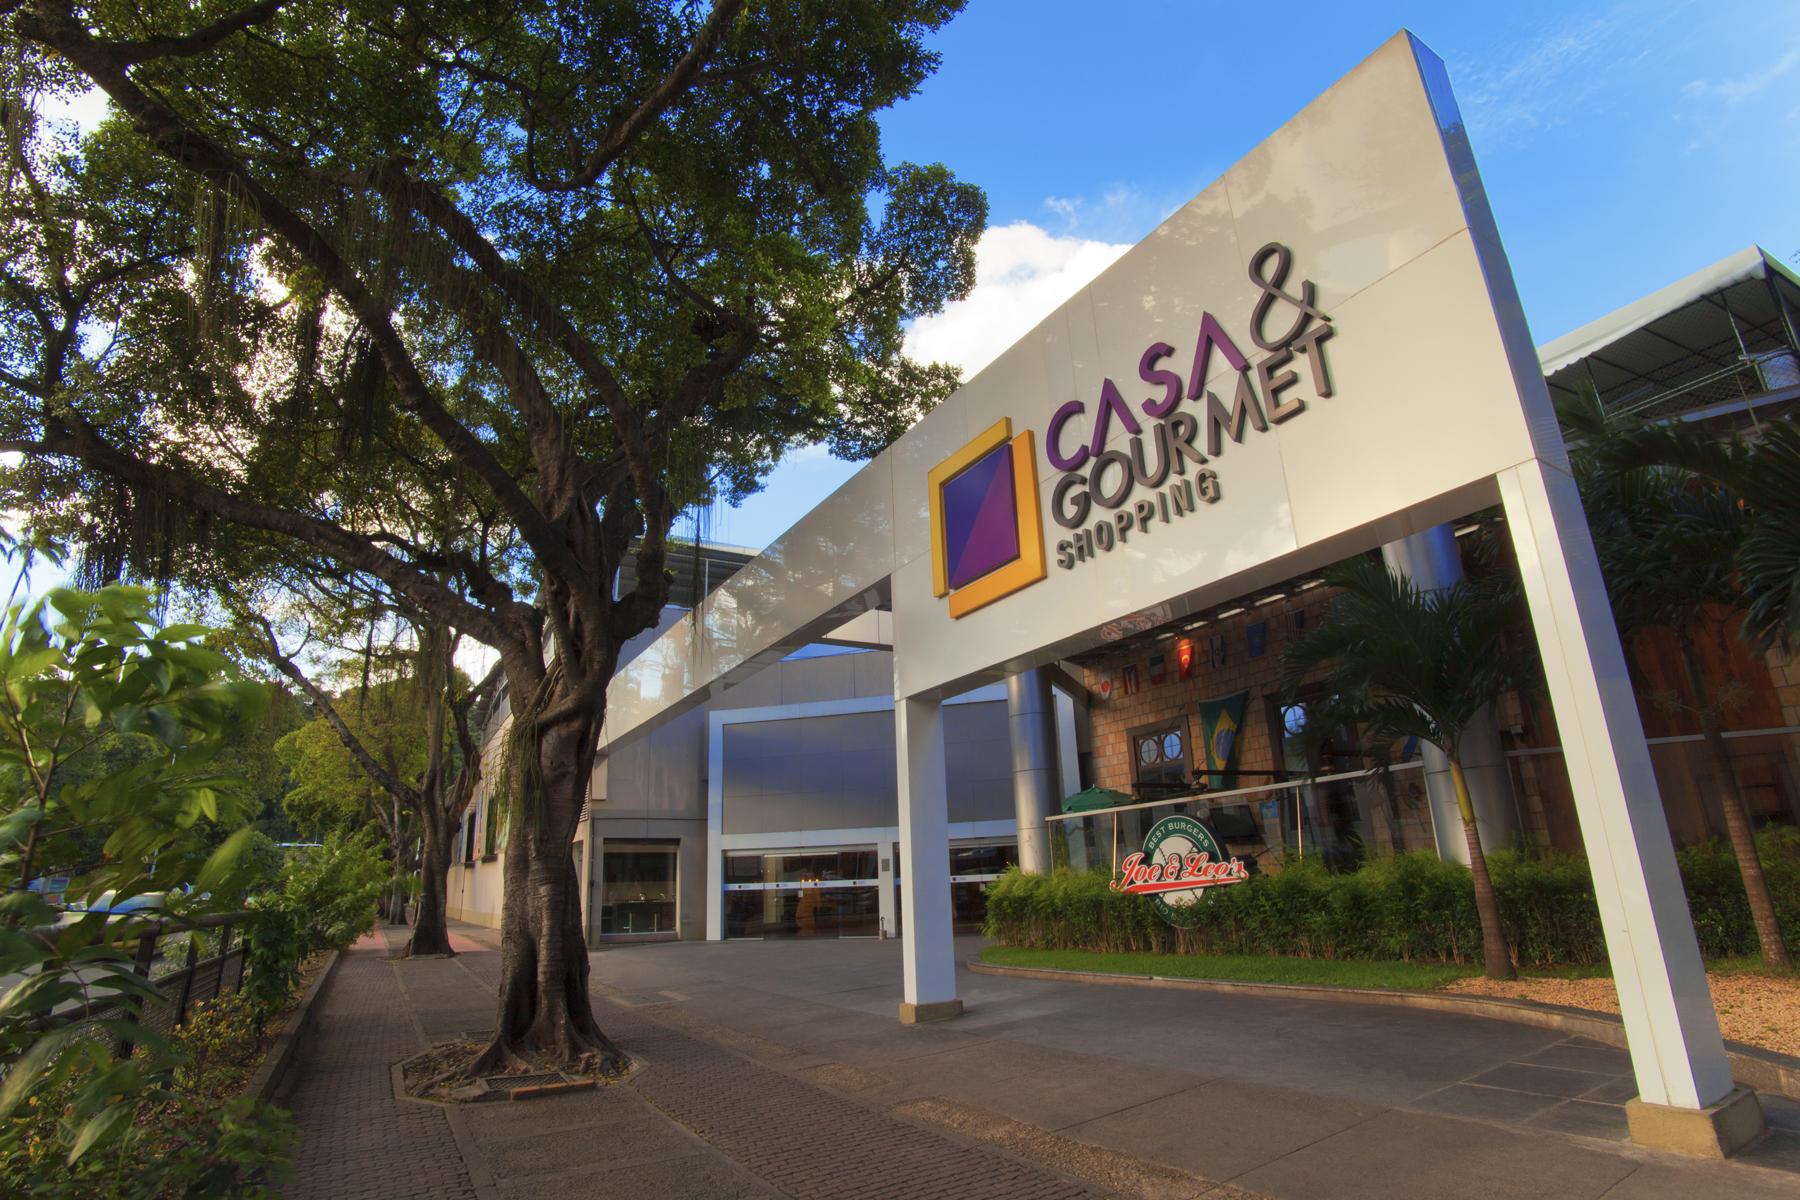 Casa & Gourmet Shopping lança Experience 2016